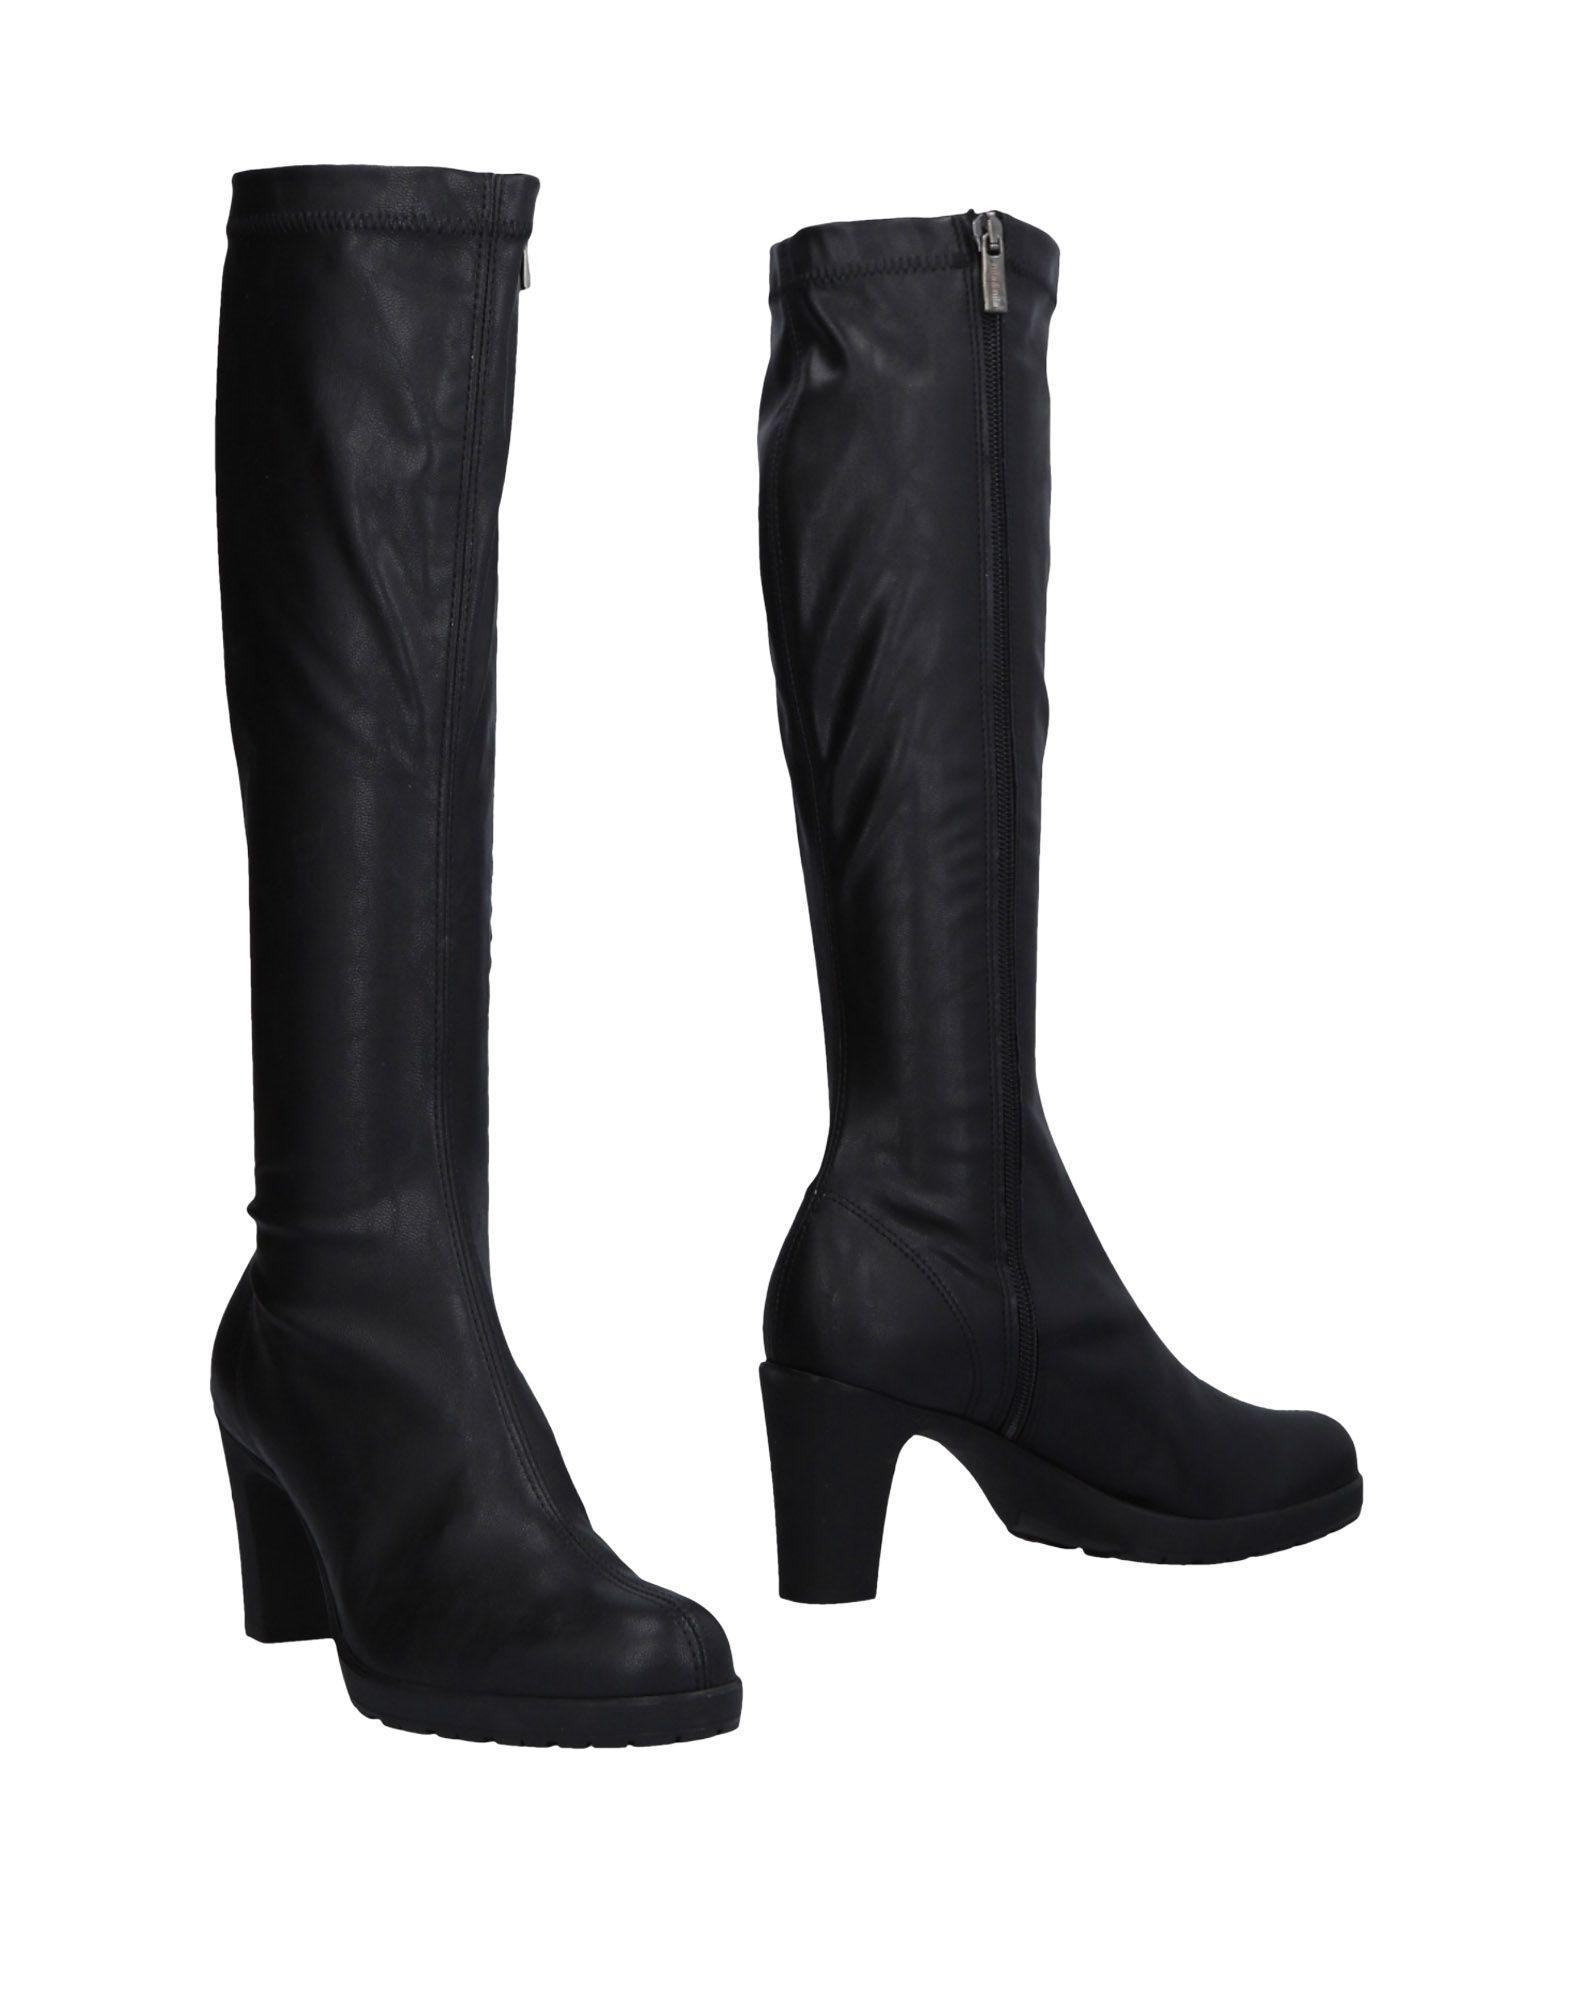 Nila & Nila Stiefel Damen  11476761PS Gute Qualität beliebte Schuhe